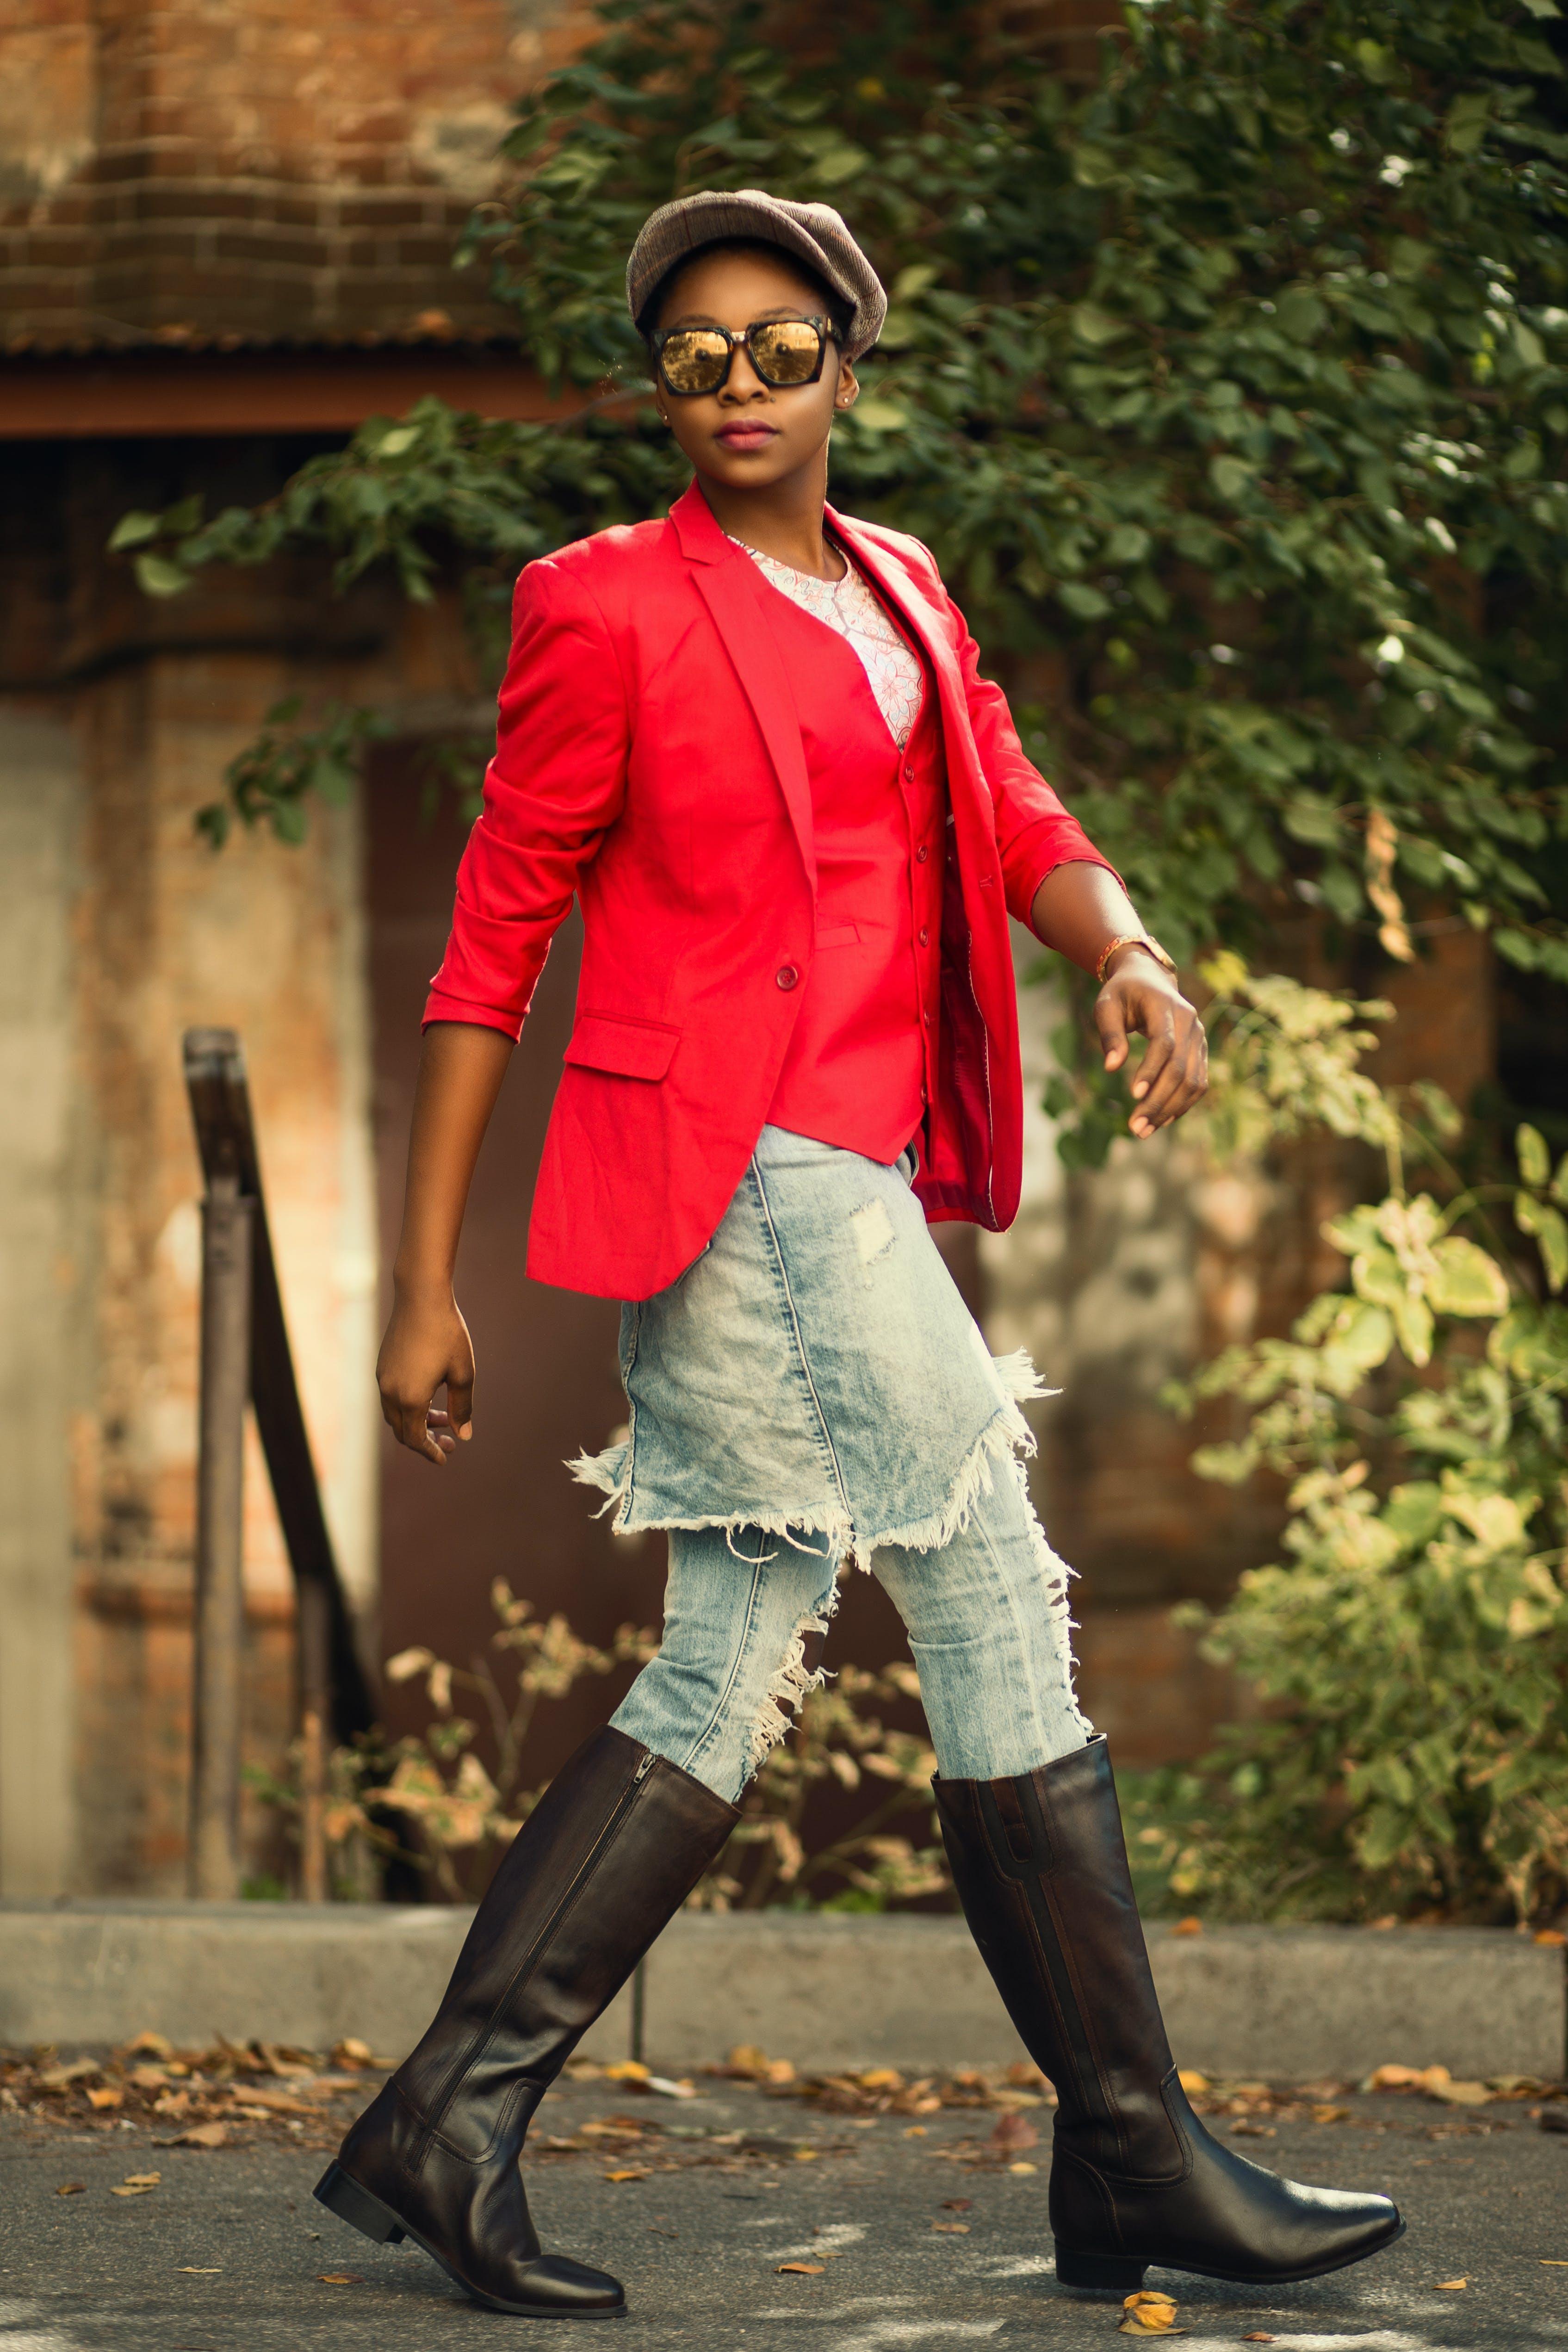 Kostenloses Stock Foto zu fashion, person, rot, sonnenbrille